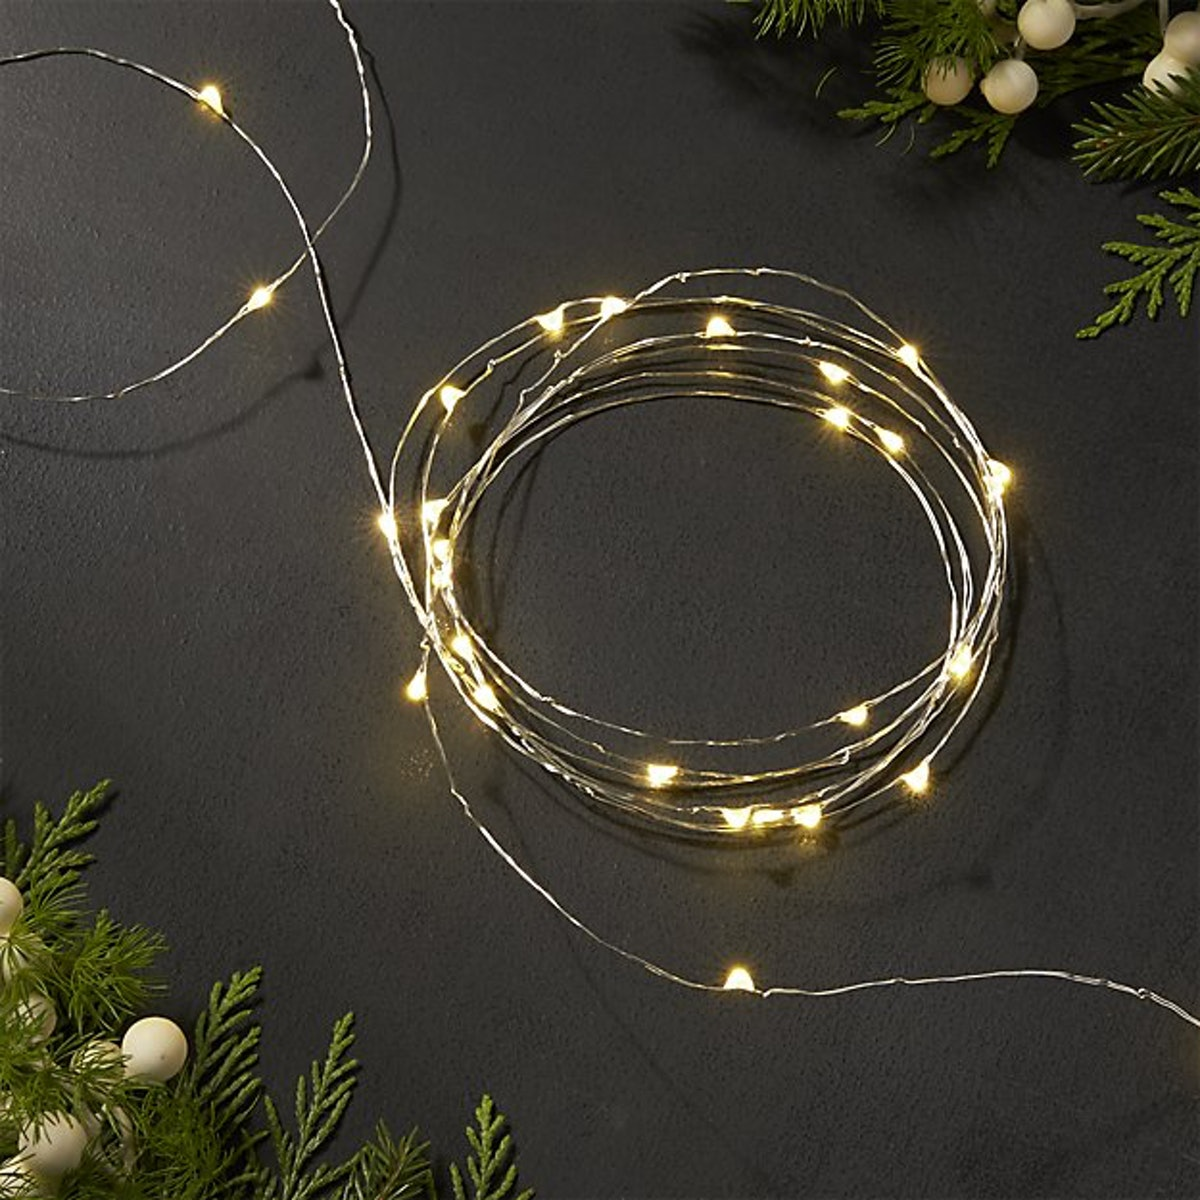 Twinkle Silver 30' String Lights